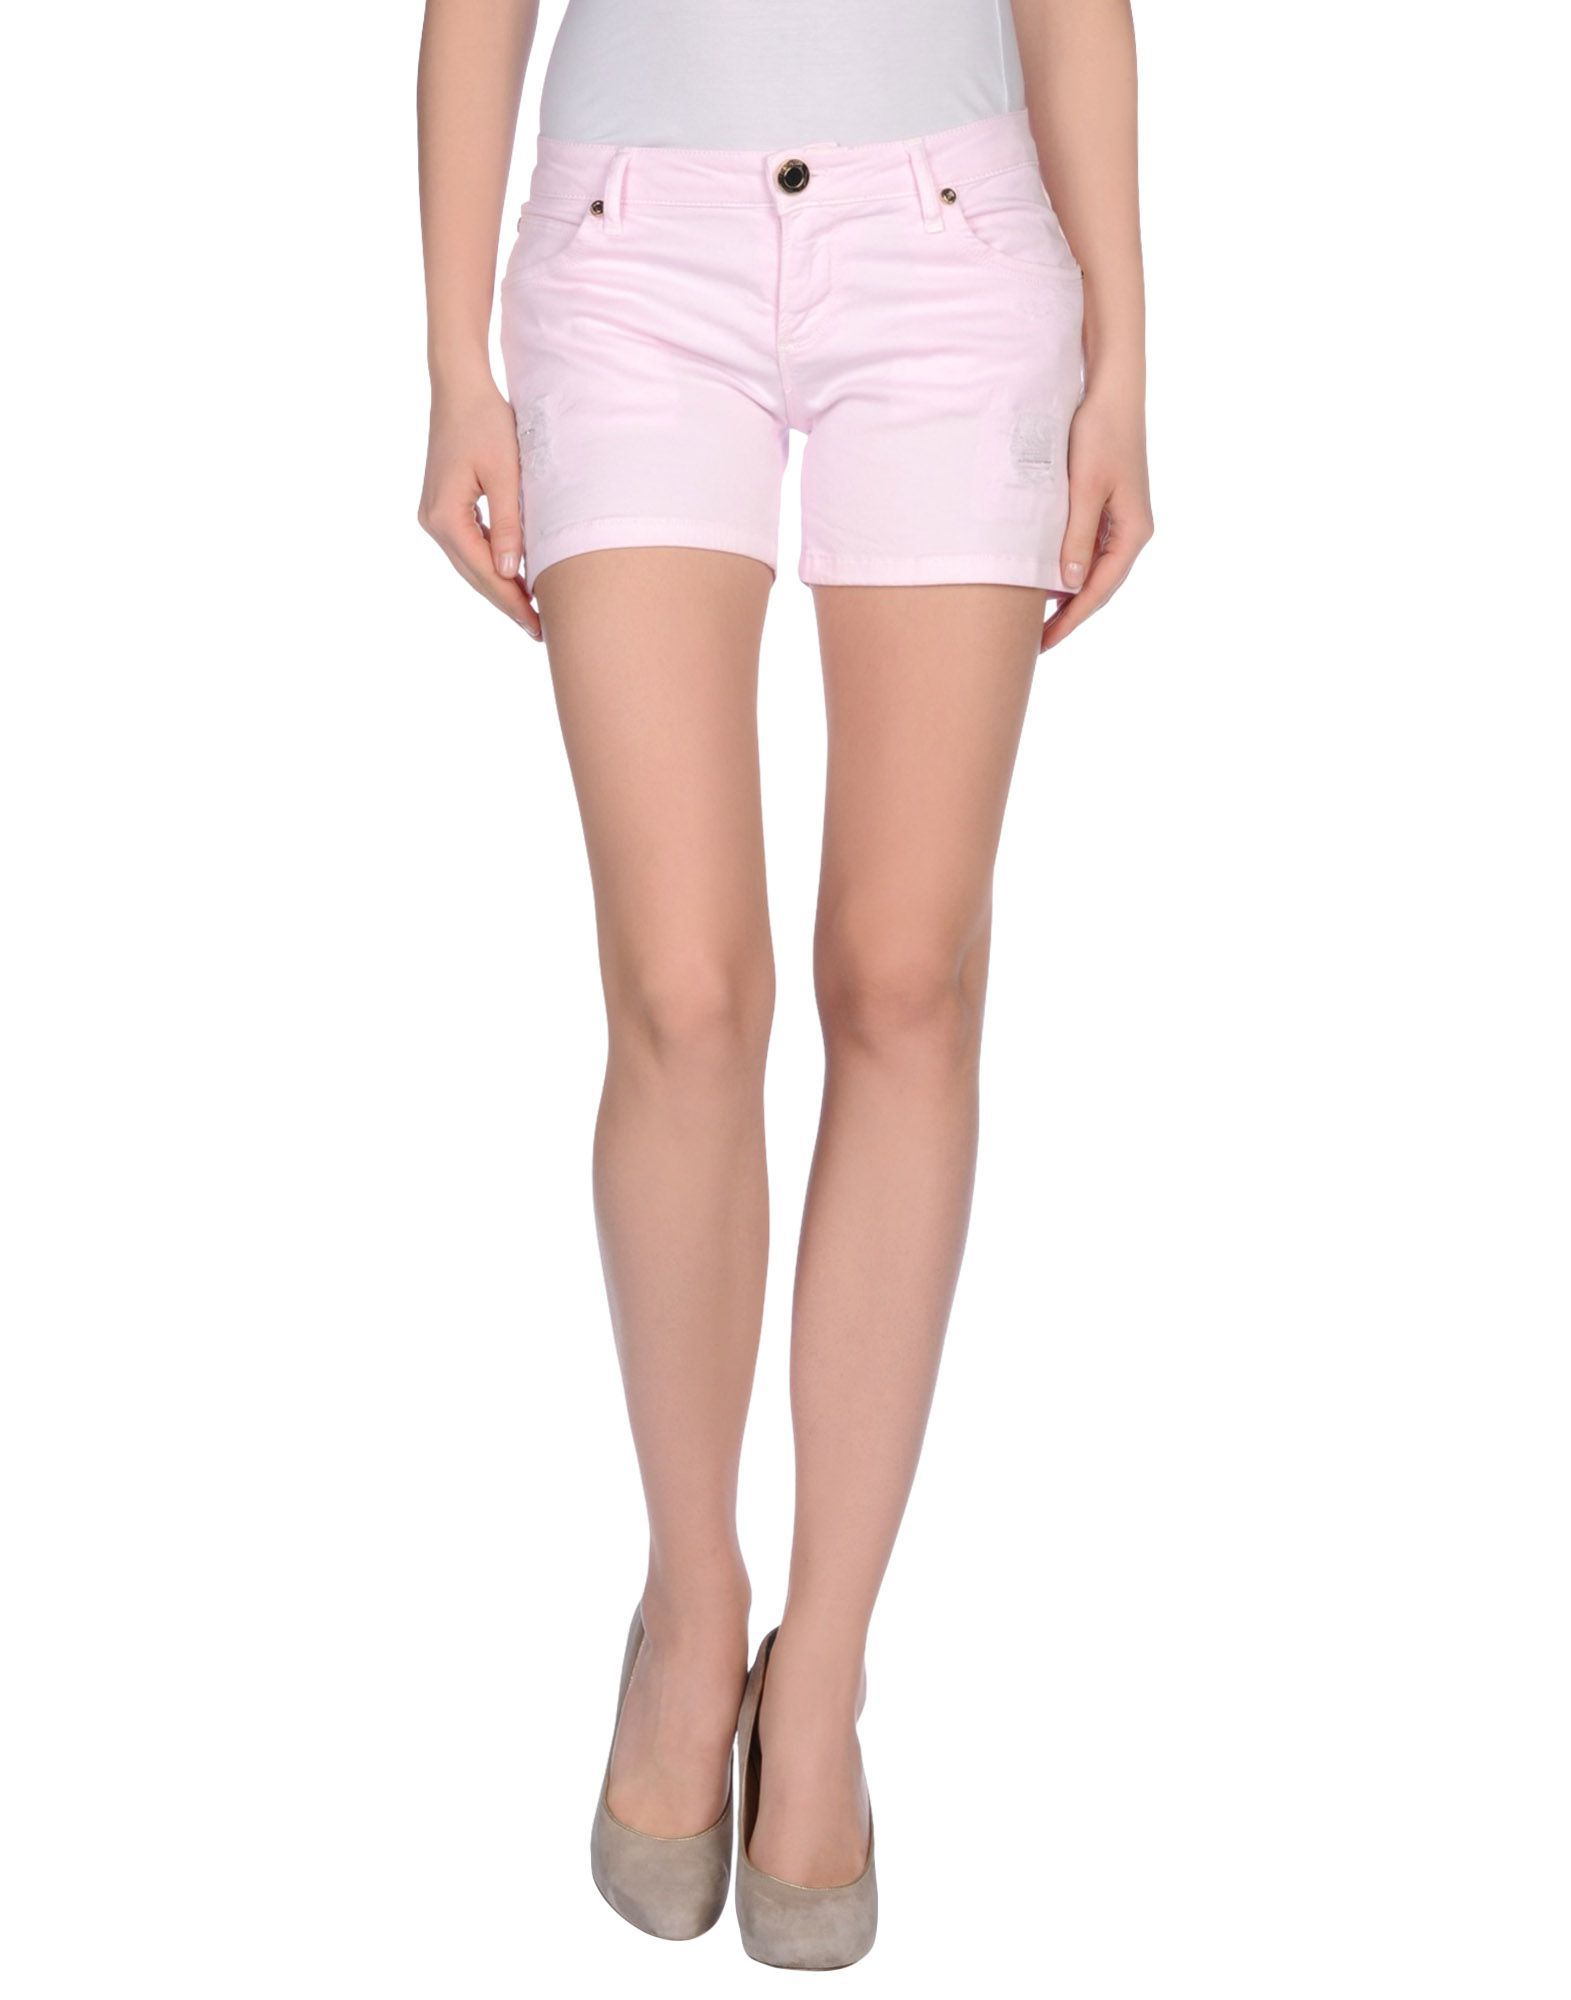 Nenette Women's Shorts Pink Cotton